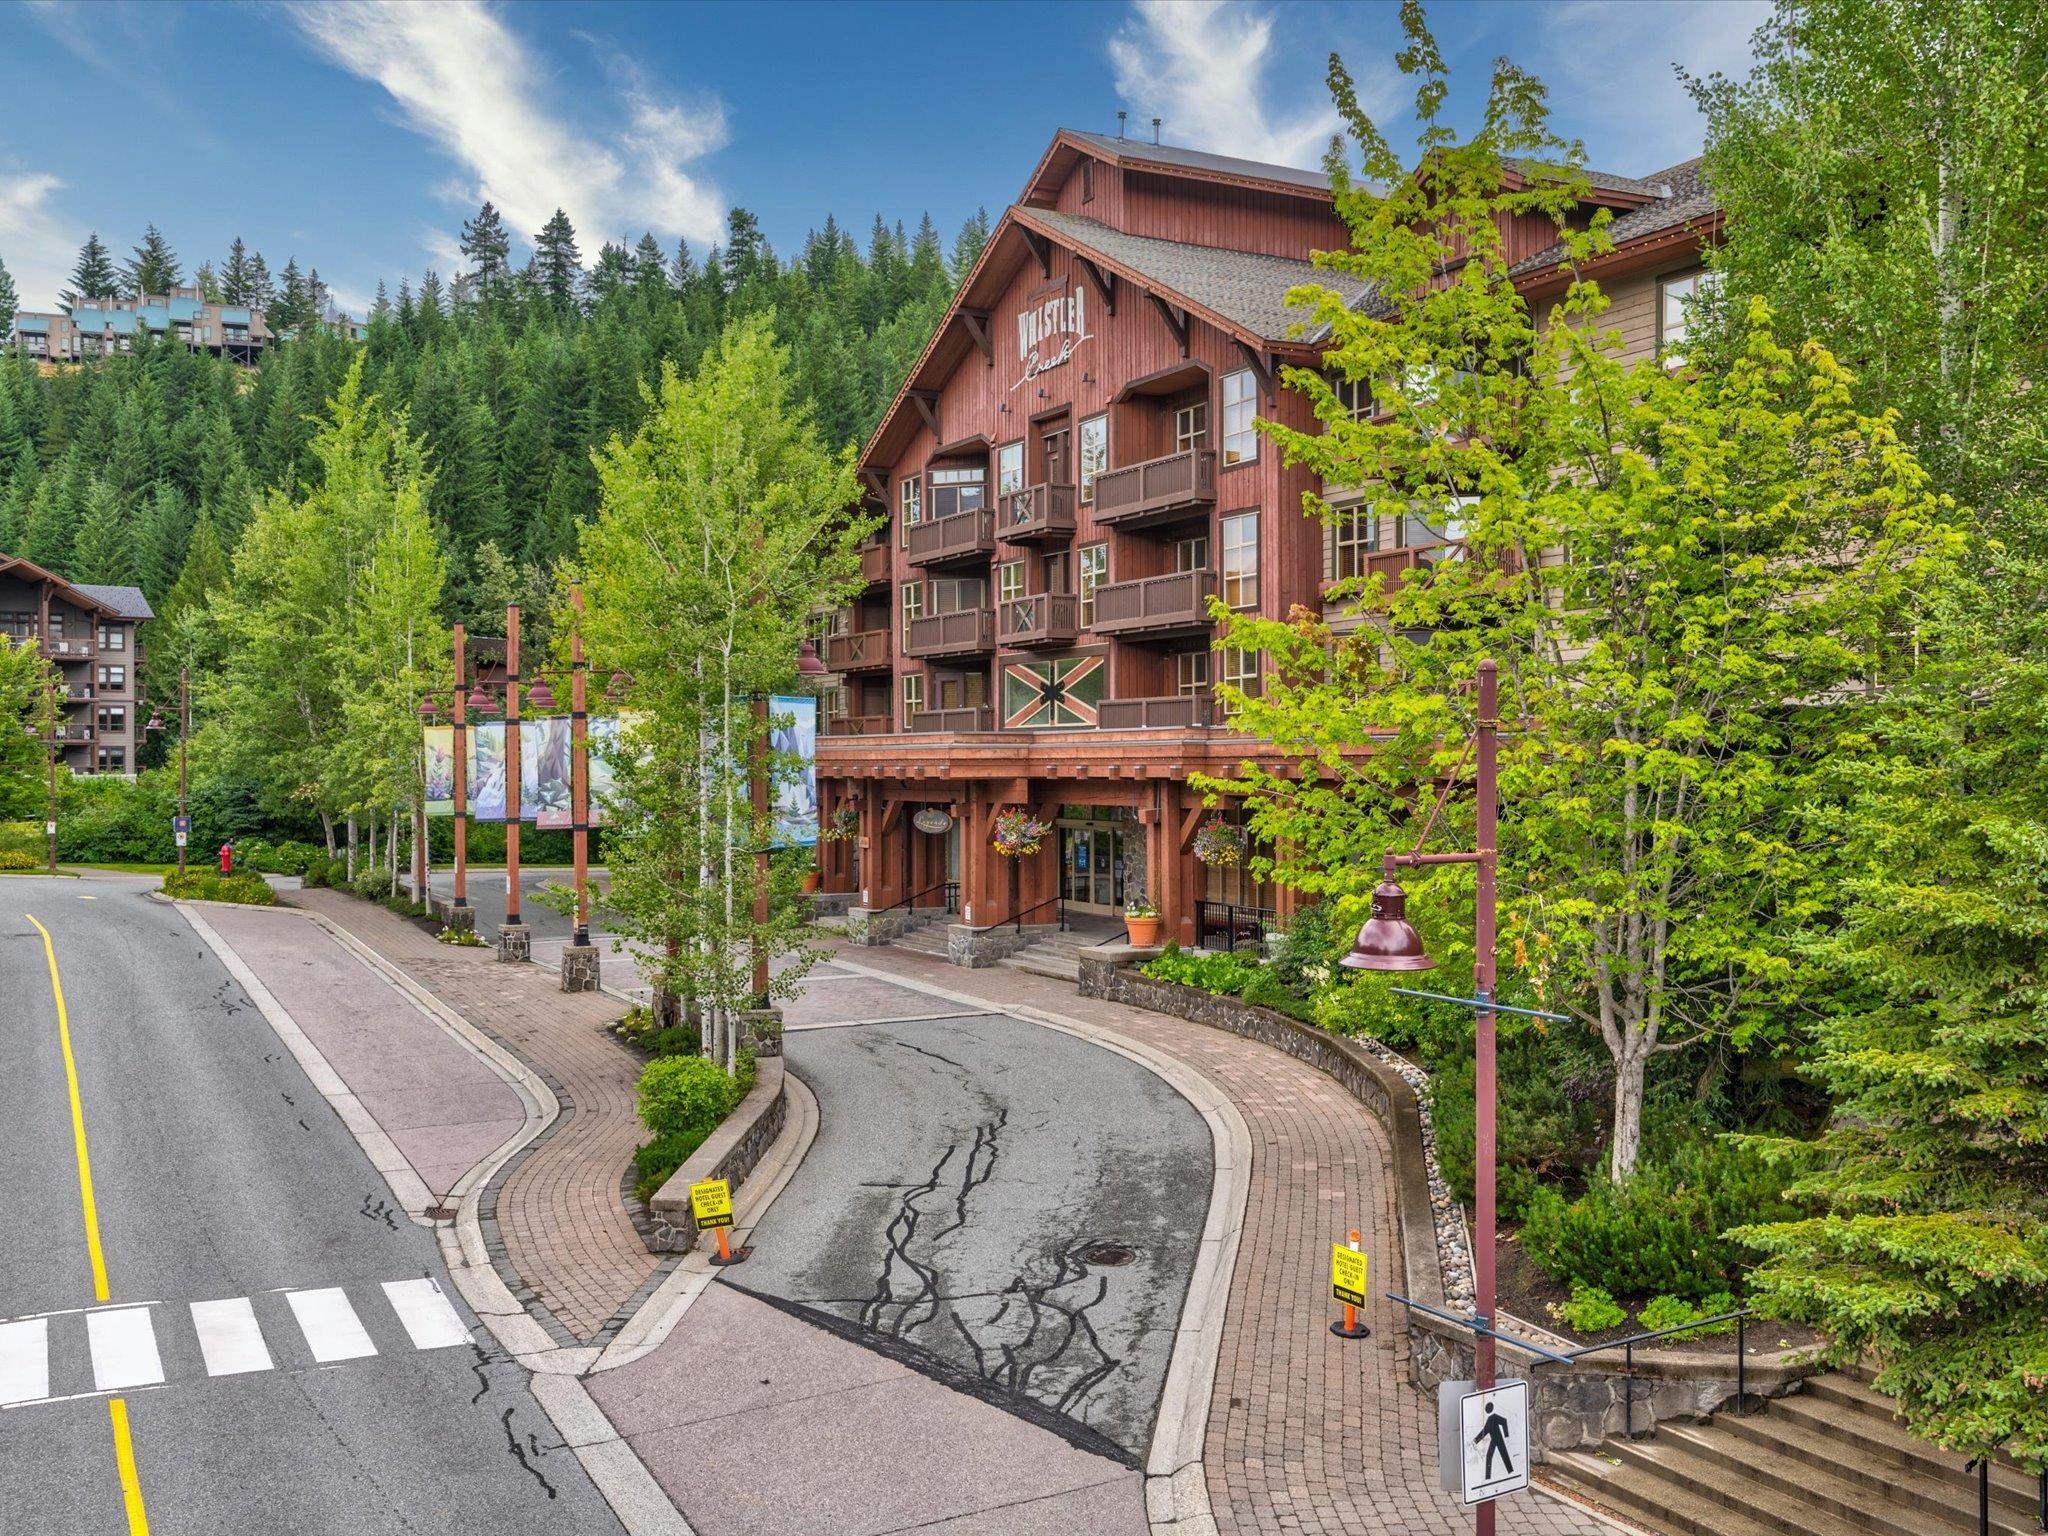 233C 2036 LONDON LANE - Whistler Creek Apartment/Condo for sale, 2 Bedrooms (R2618754)